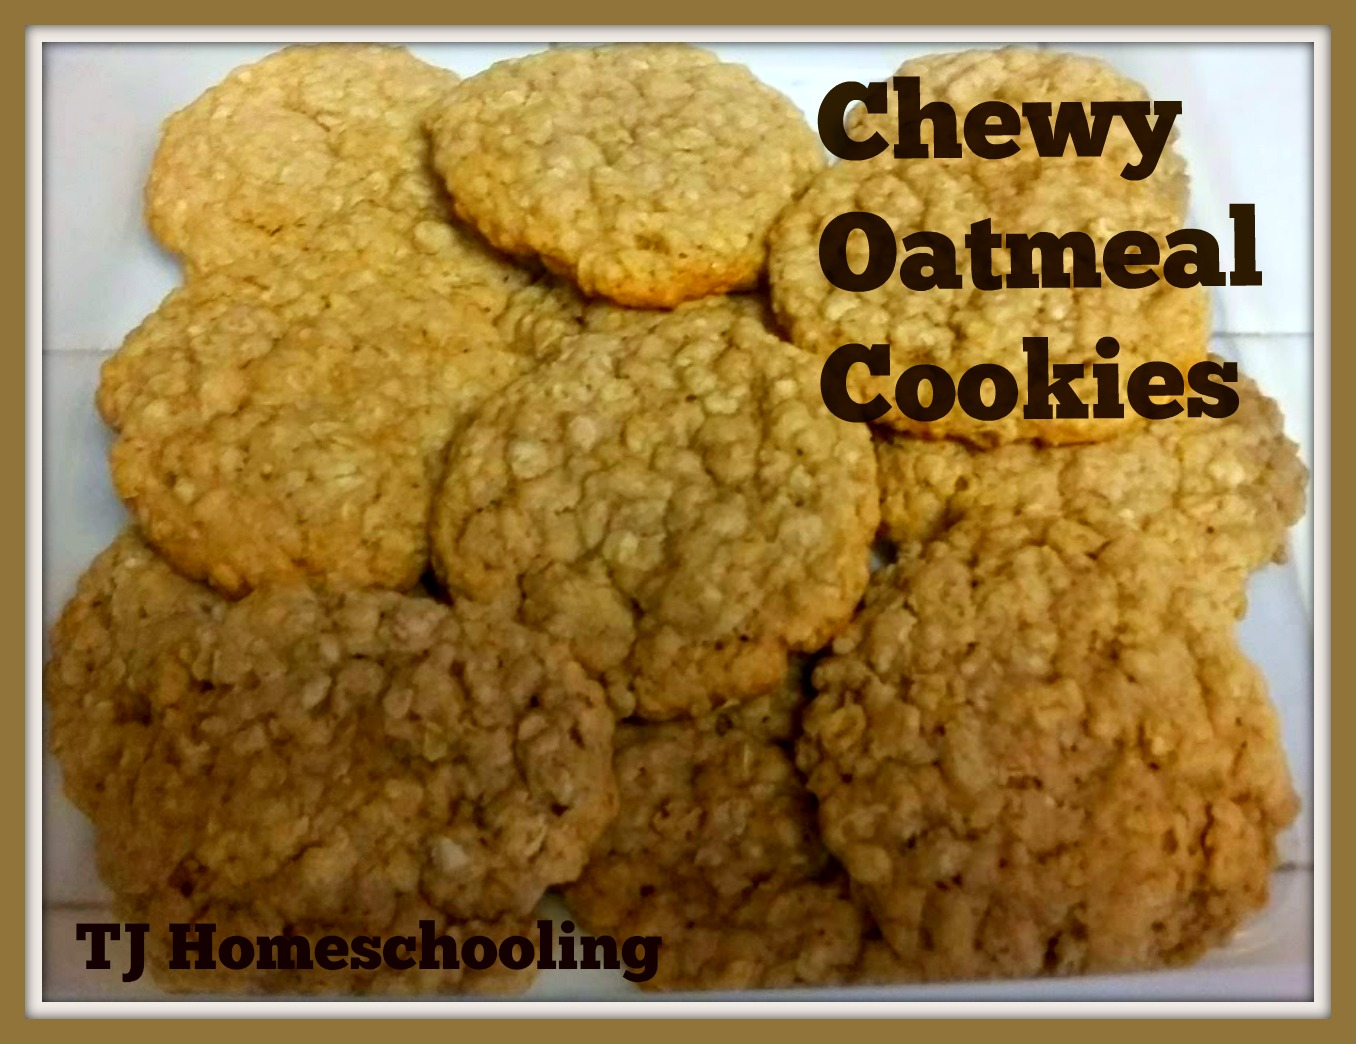 Chewy Oatmeal Cookies ~ TJ Homeschooling